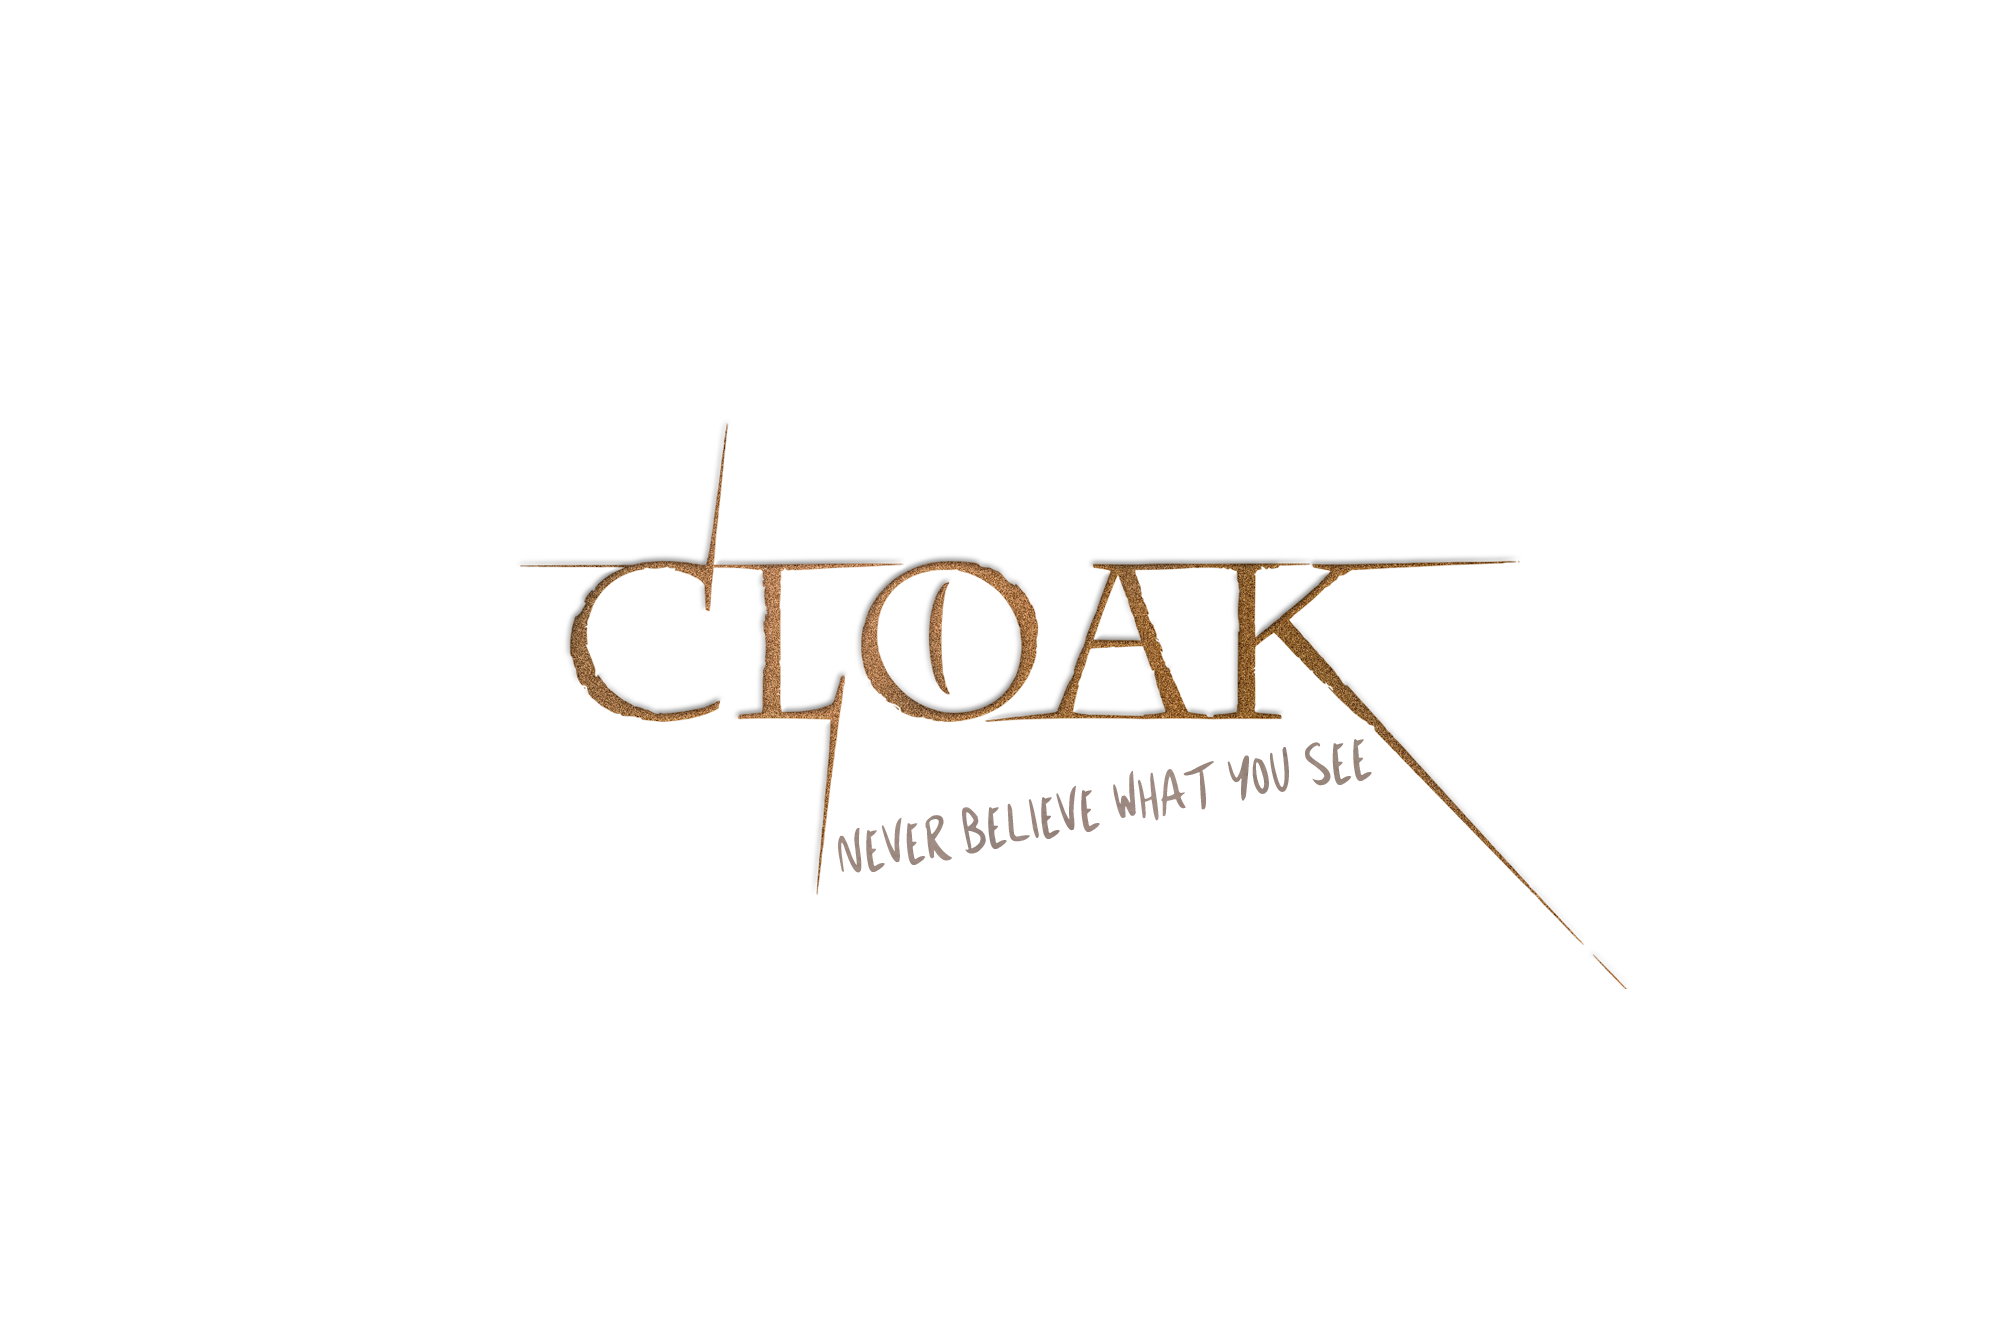 Cloak small NBWYS